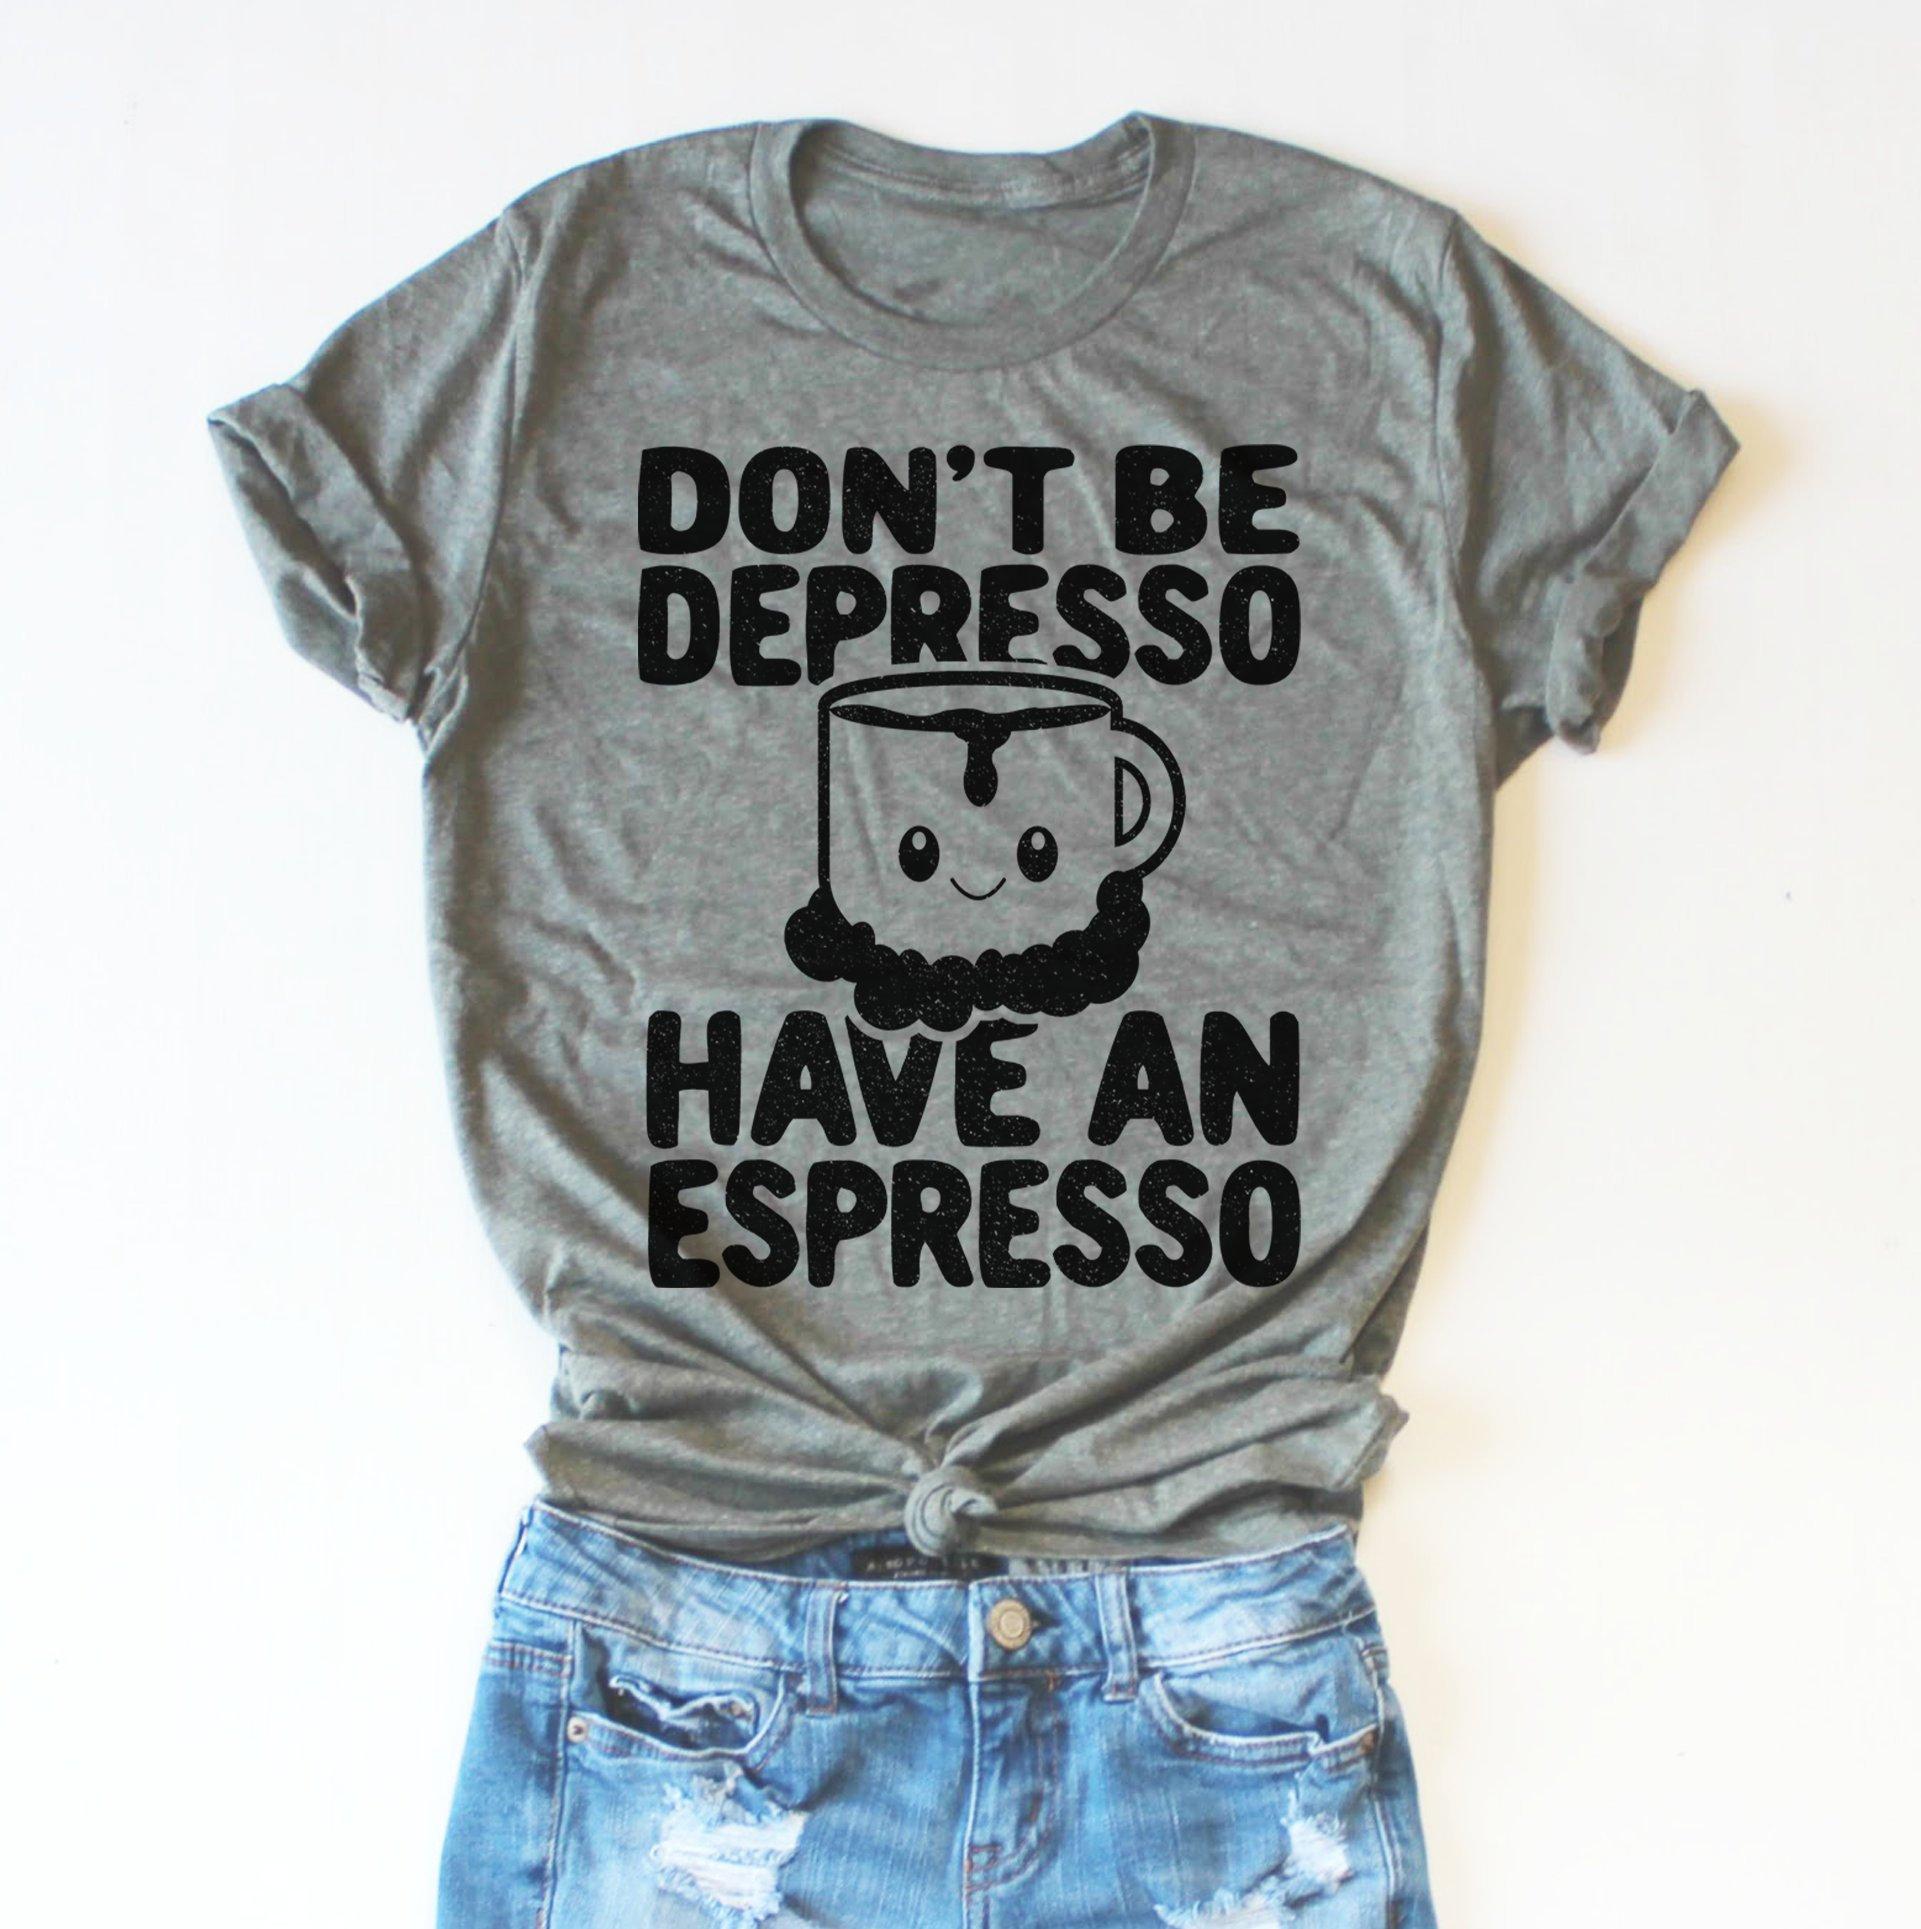 il_fullxfull.1779724003_hhgv.jpg #coffeeTime